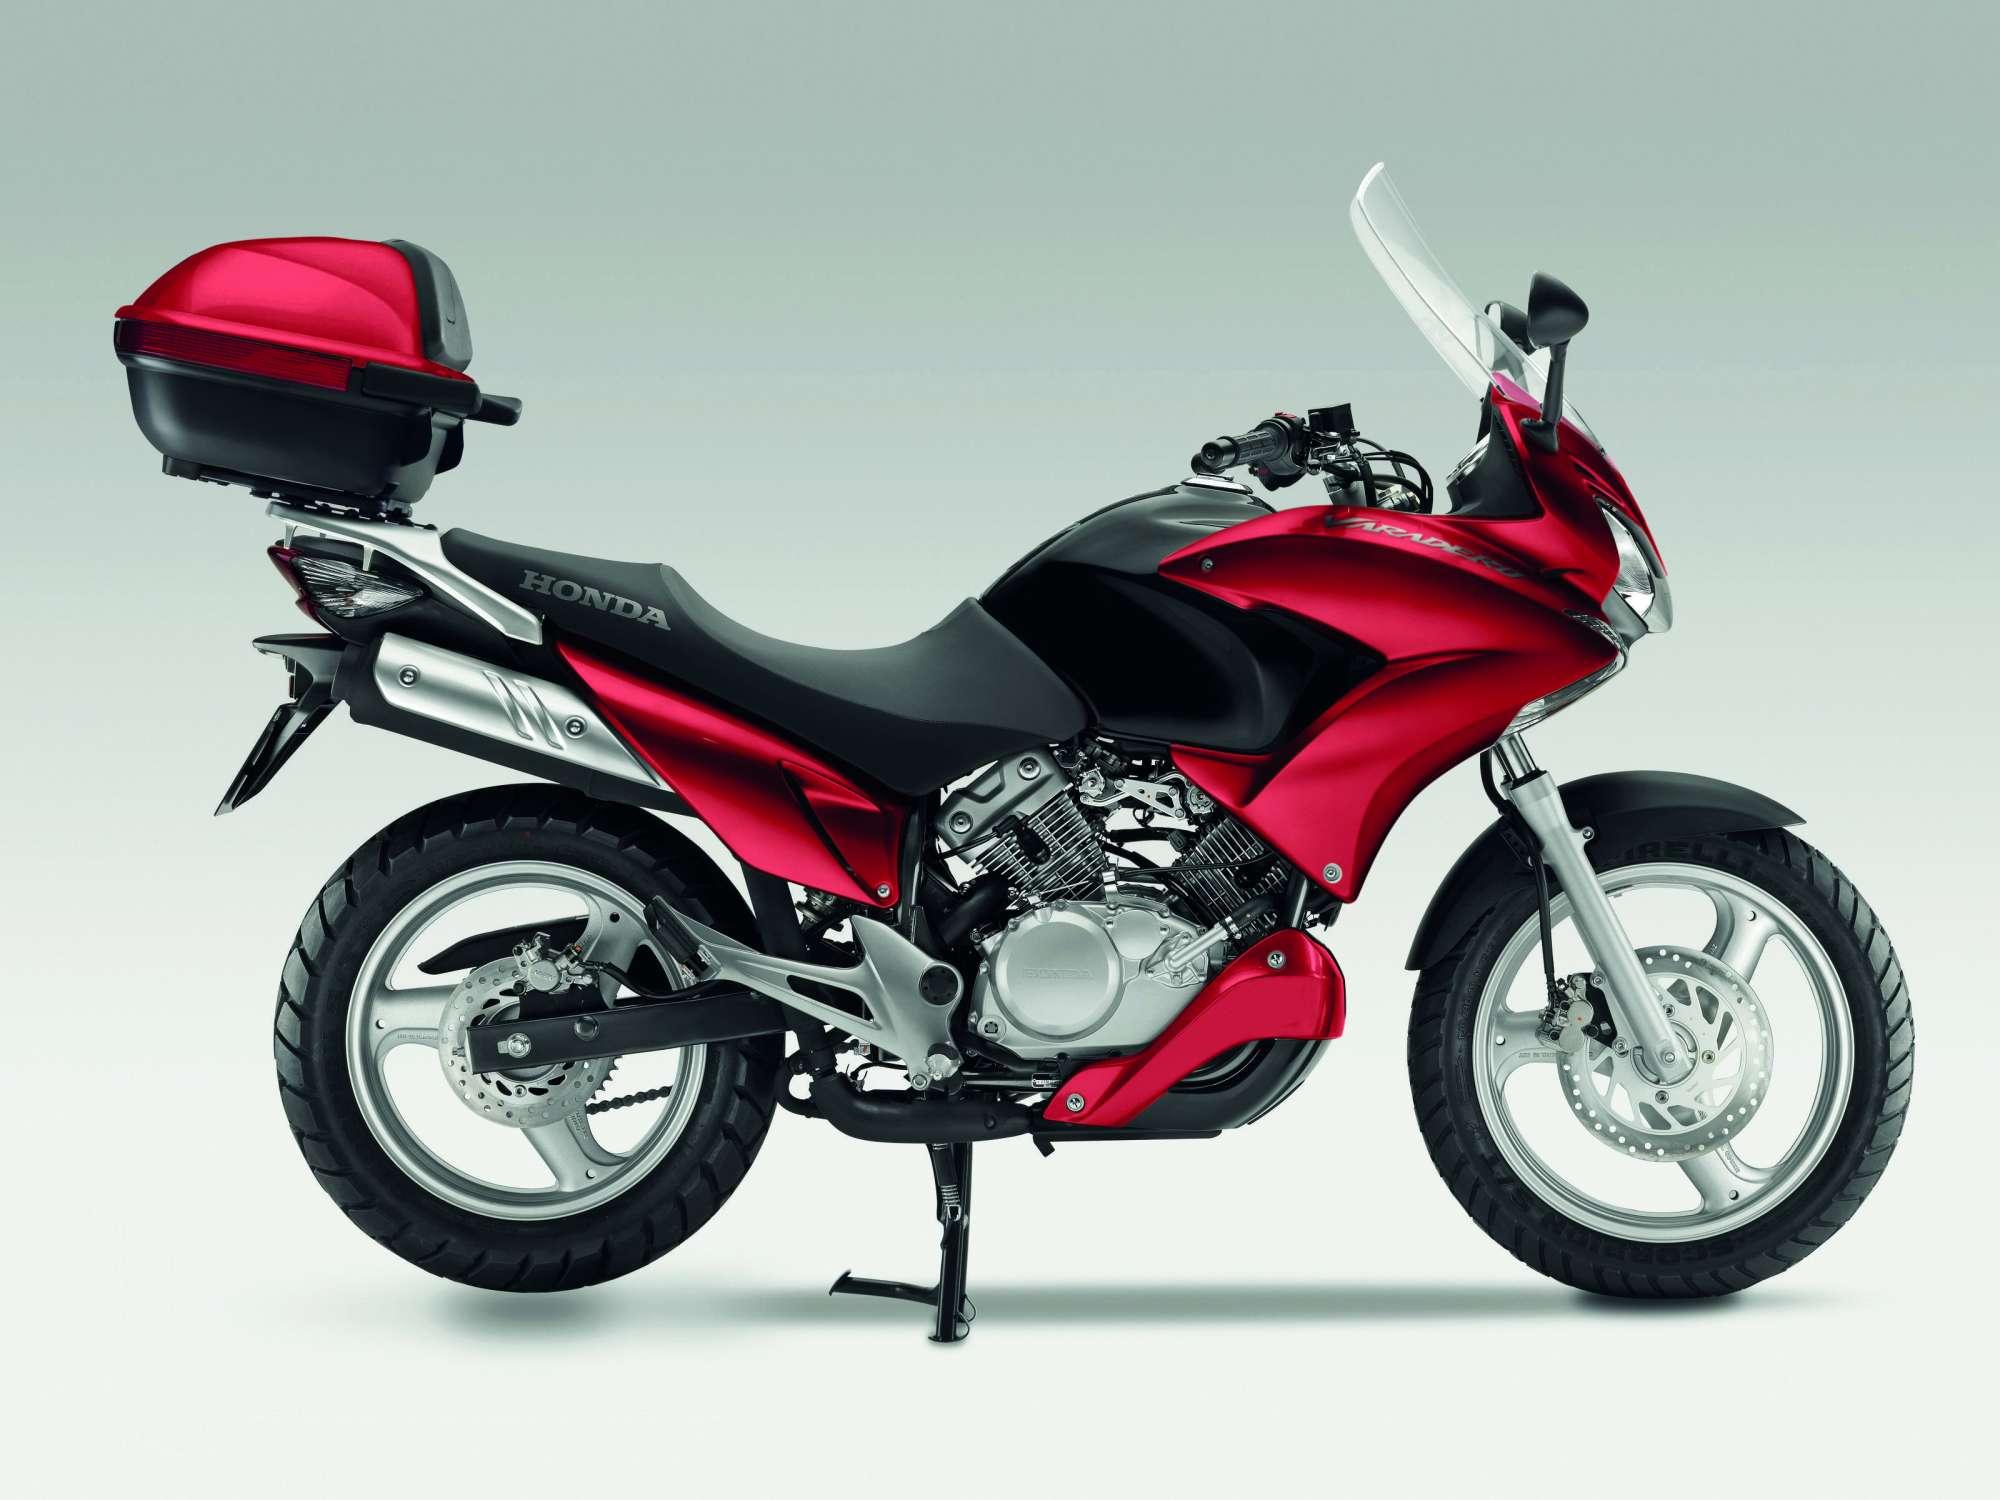 honda varadero 125 motocykl jedyny w swoim rodzaju jedno motocykle skutery. Black Bedroom Furniture Sets. Home Design Ideas